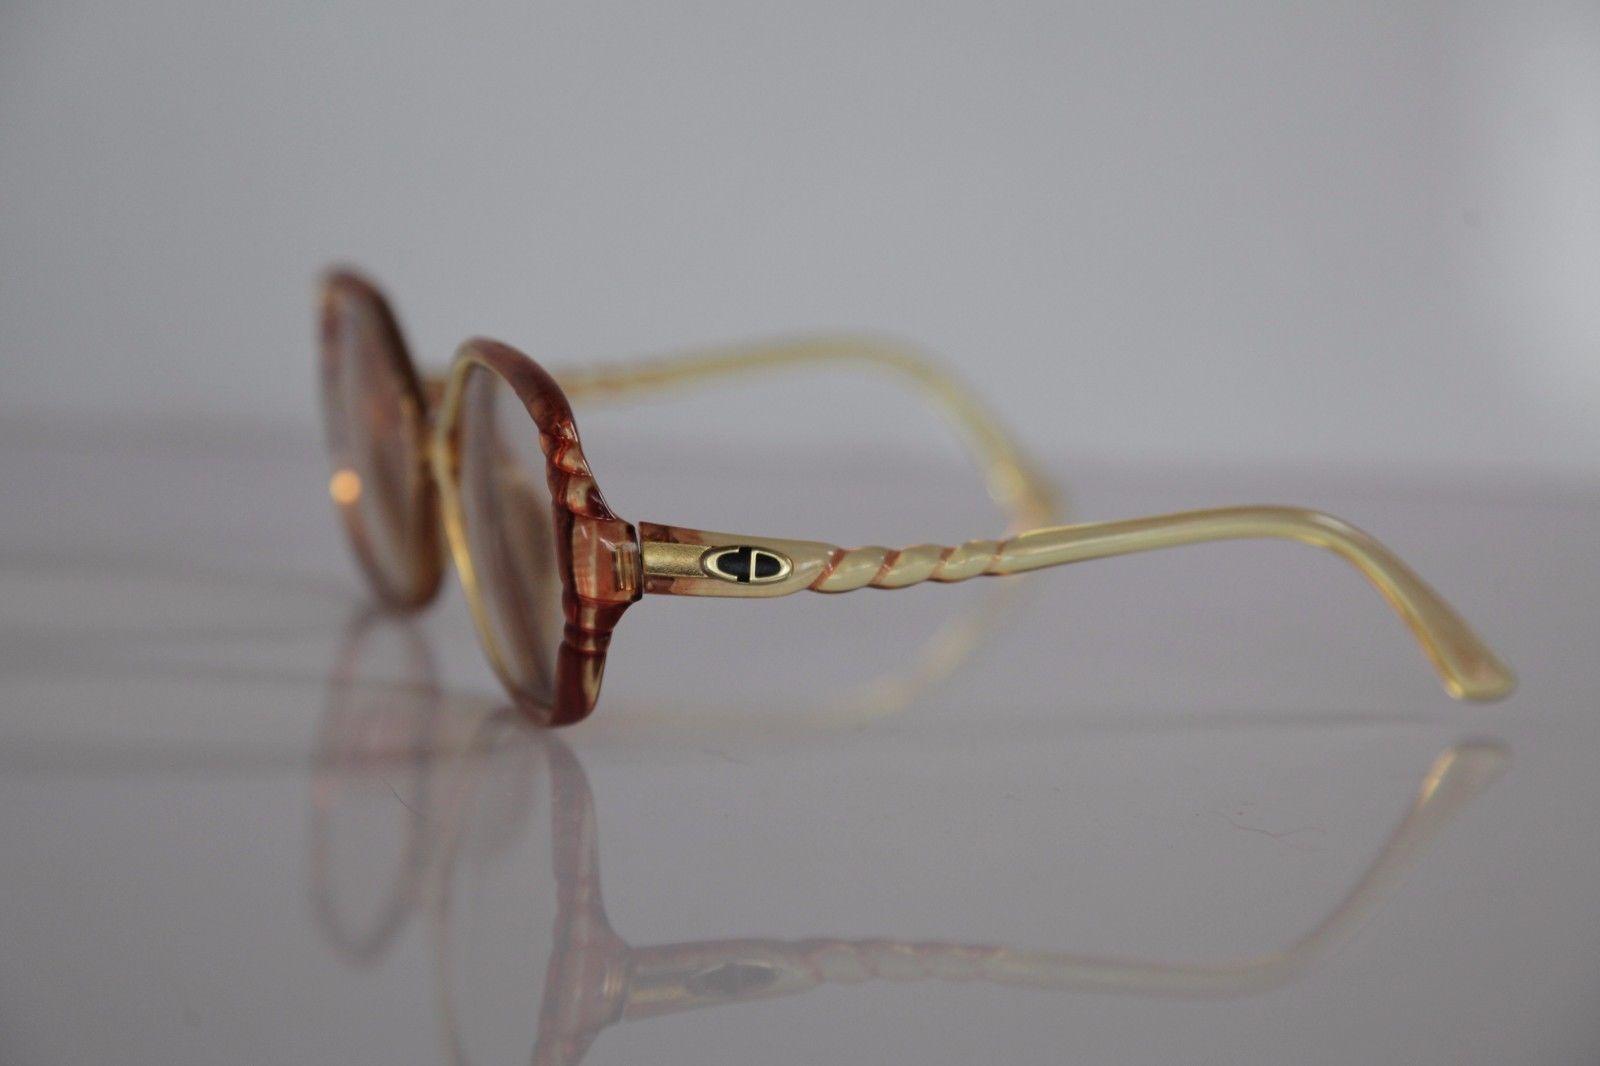 Vintage CHRISTIAN DIOR Eyewear,  RX-Able Crystal Prescription lenses. Germany